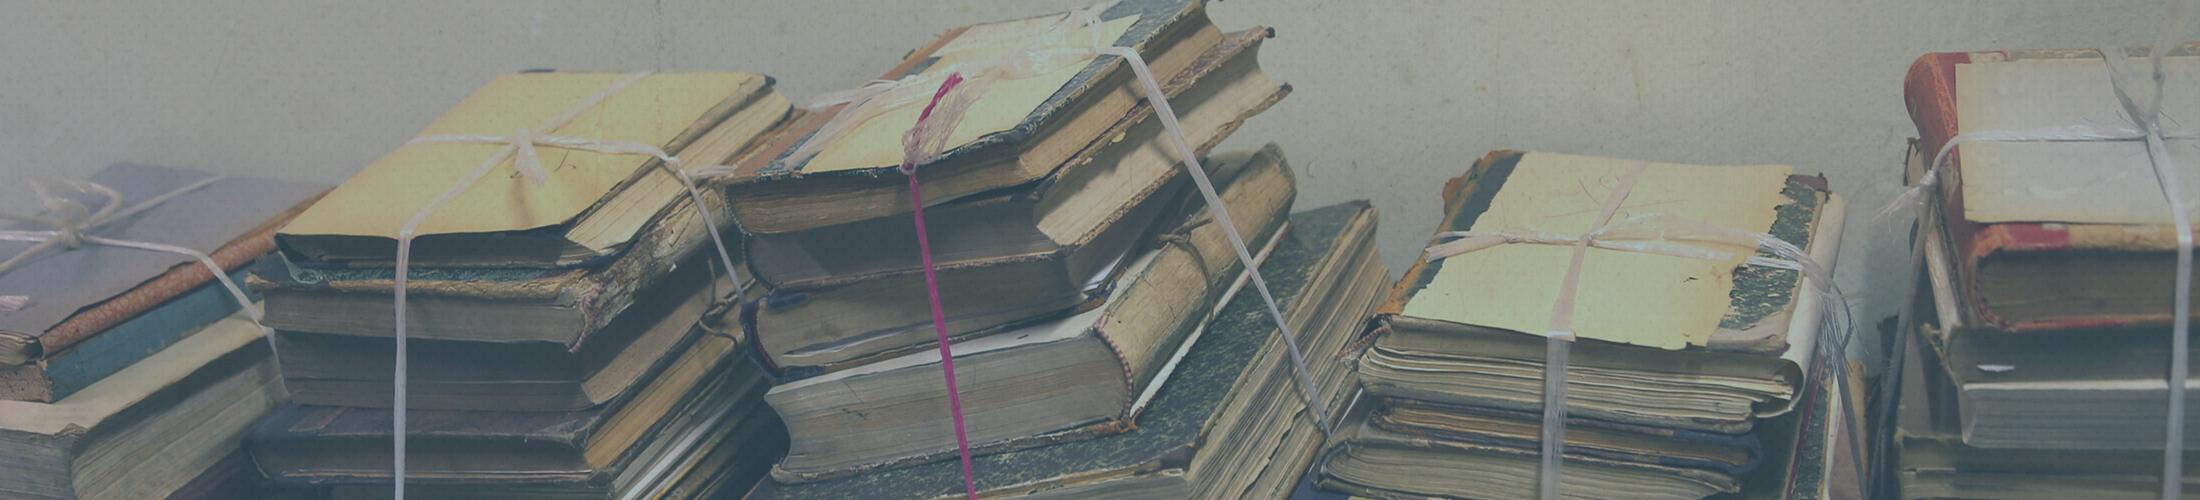 Wiederhoeren-Publikationen